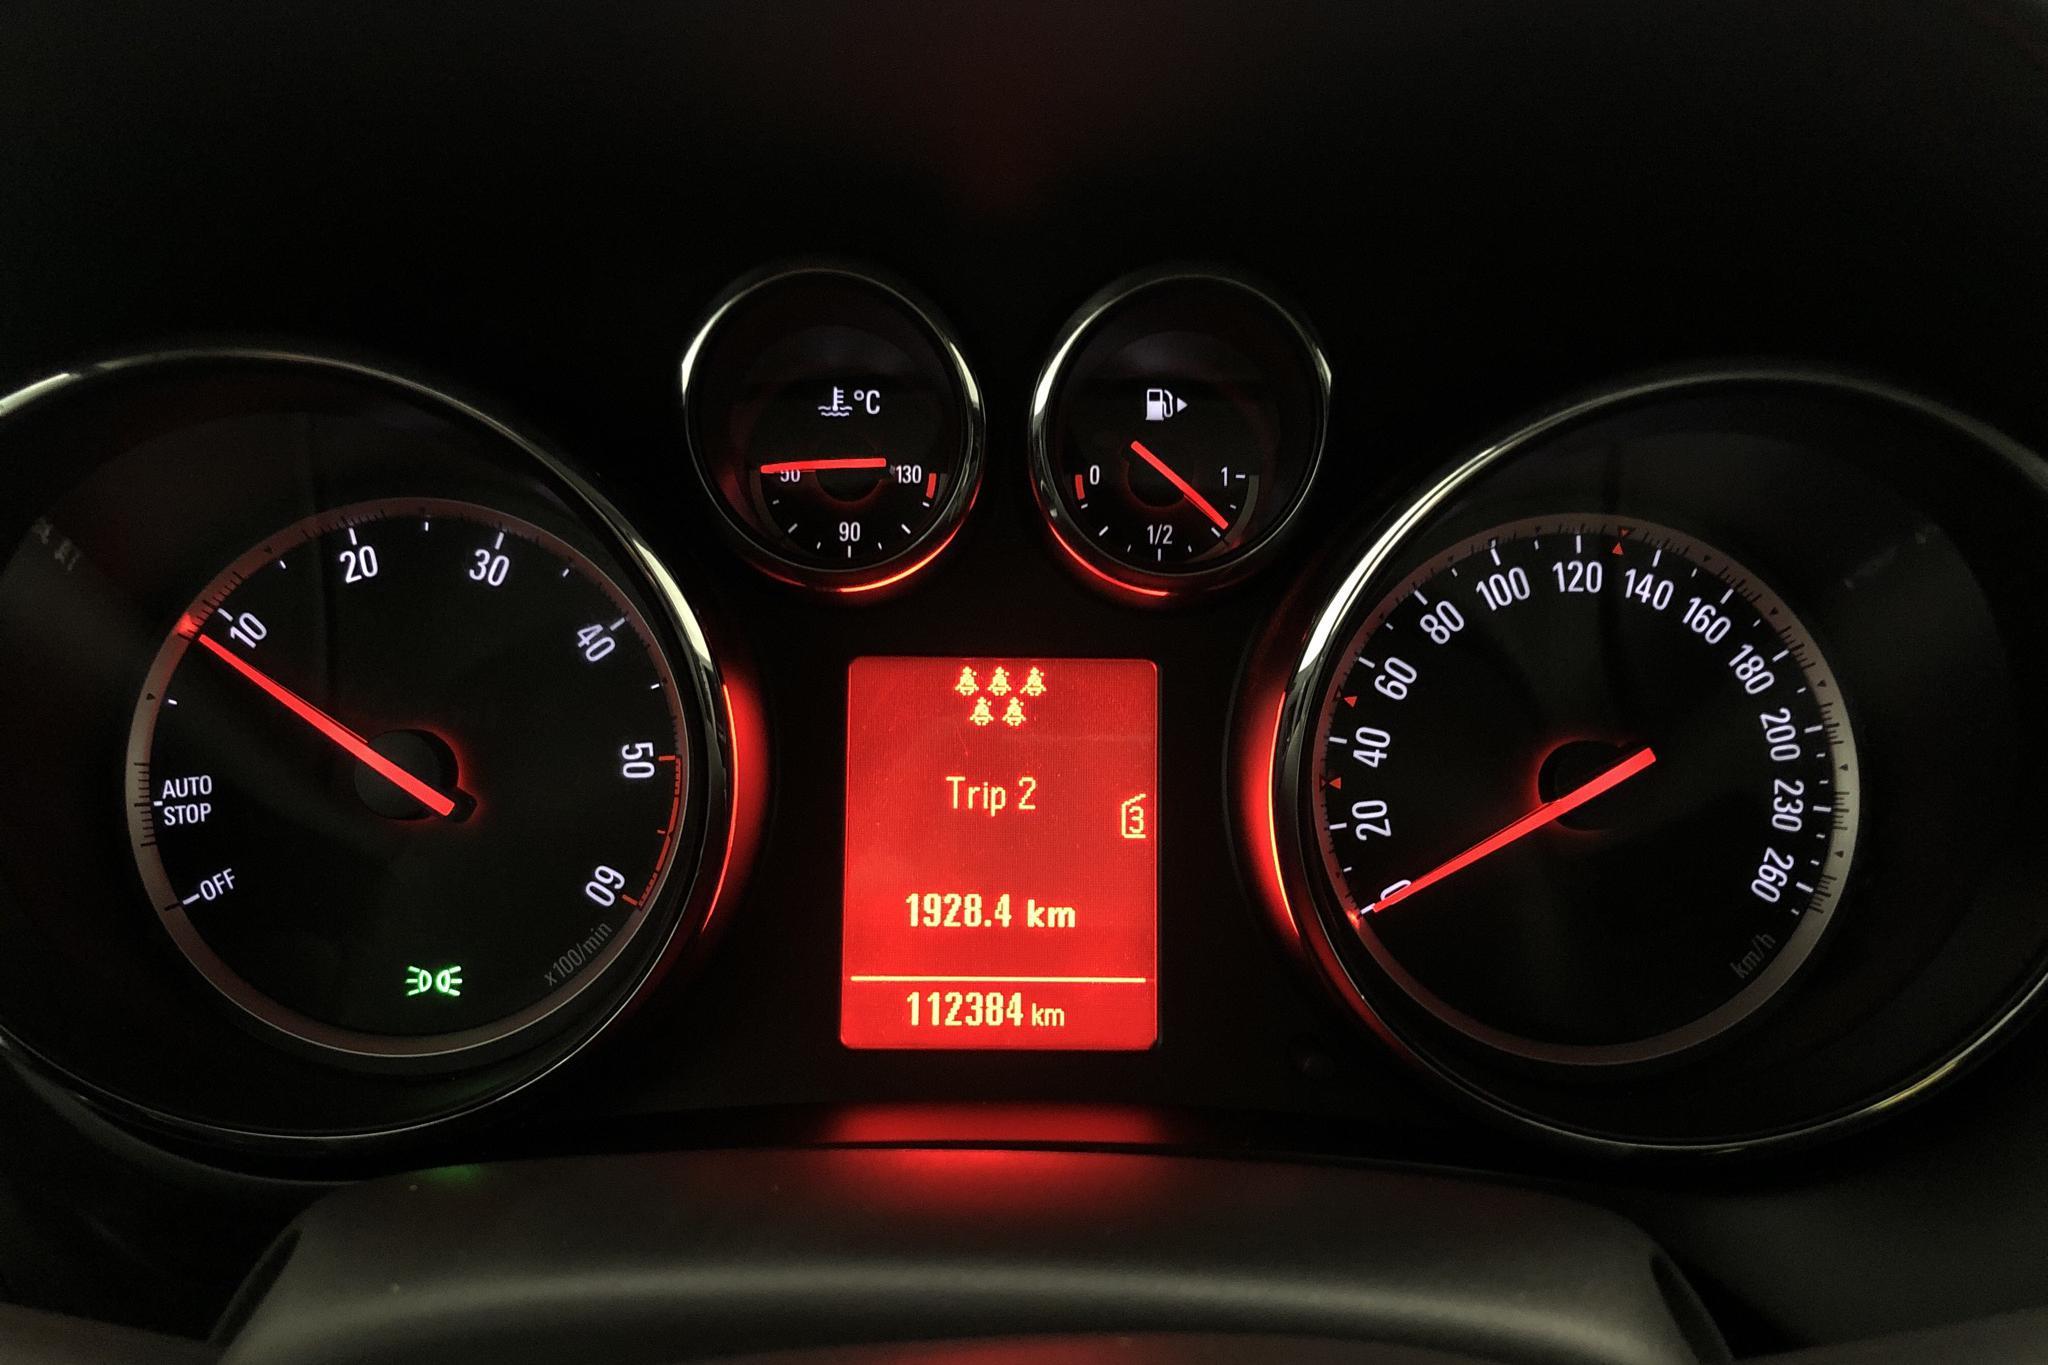 Opel Zafira Tourer 2.0 CDTI ecoFLEX (130hk) - 11 238 mil - Manuell - 2012